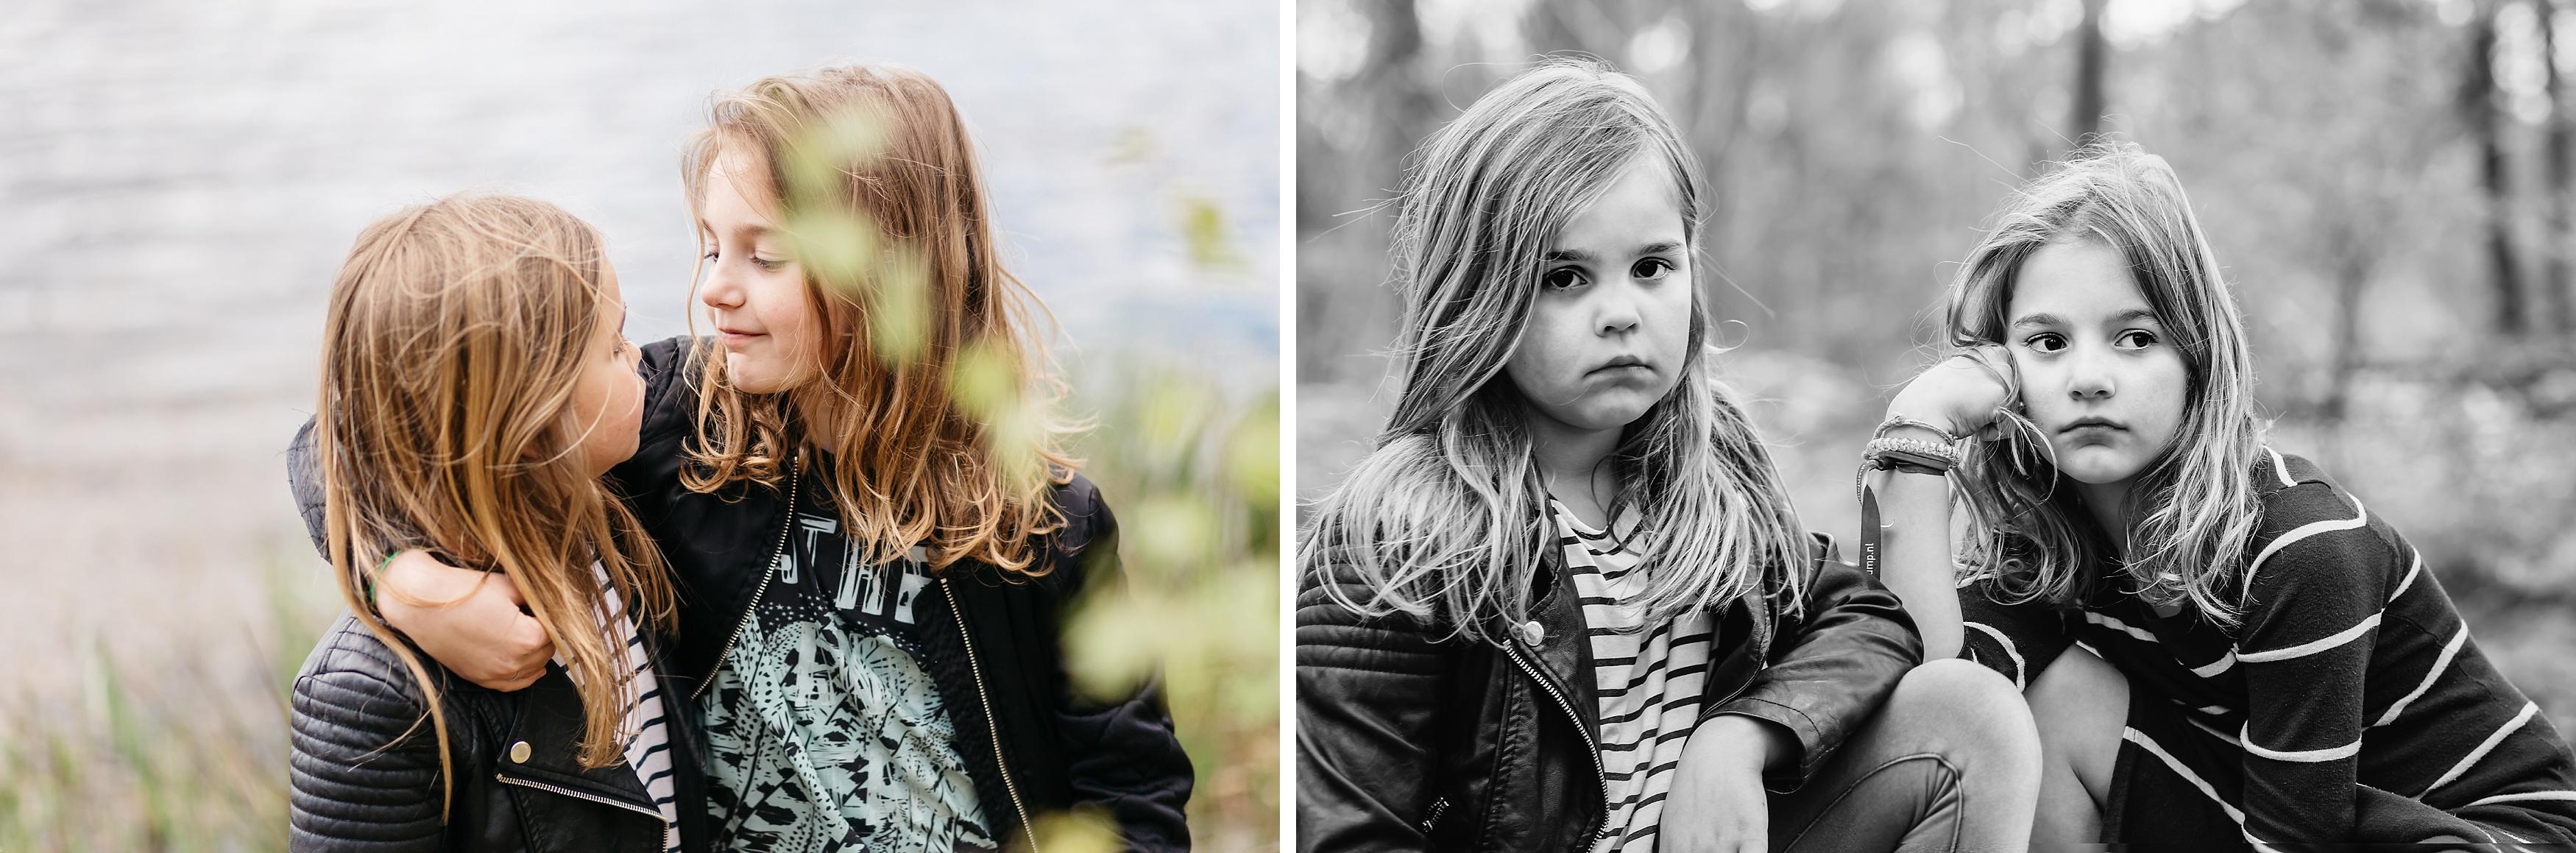 Stoere kinderfotografie